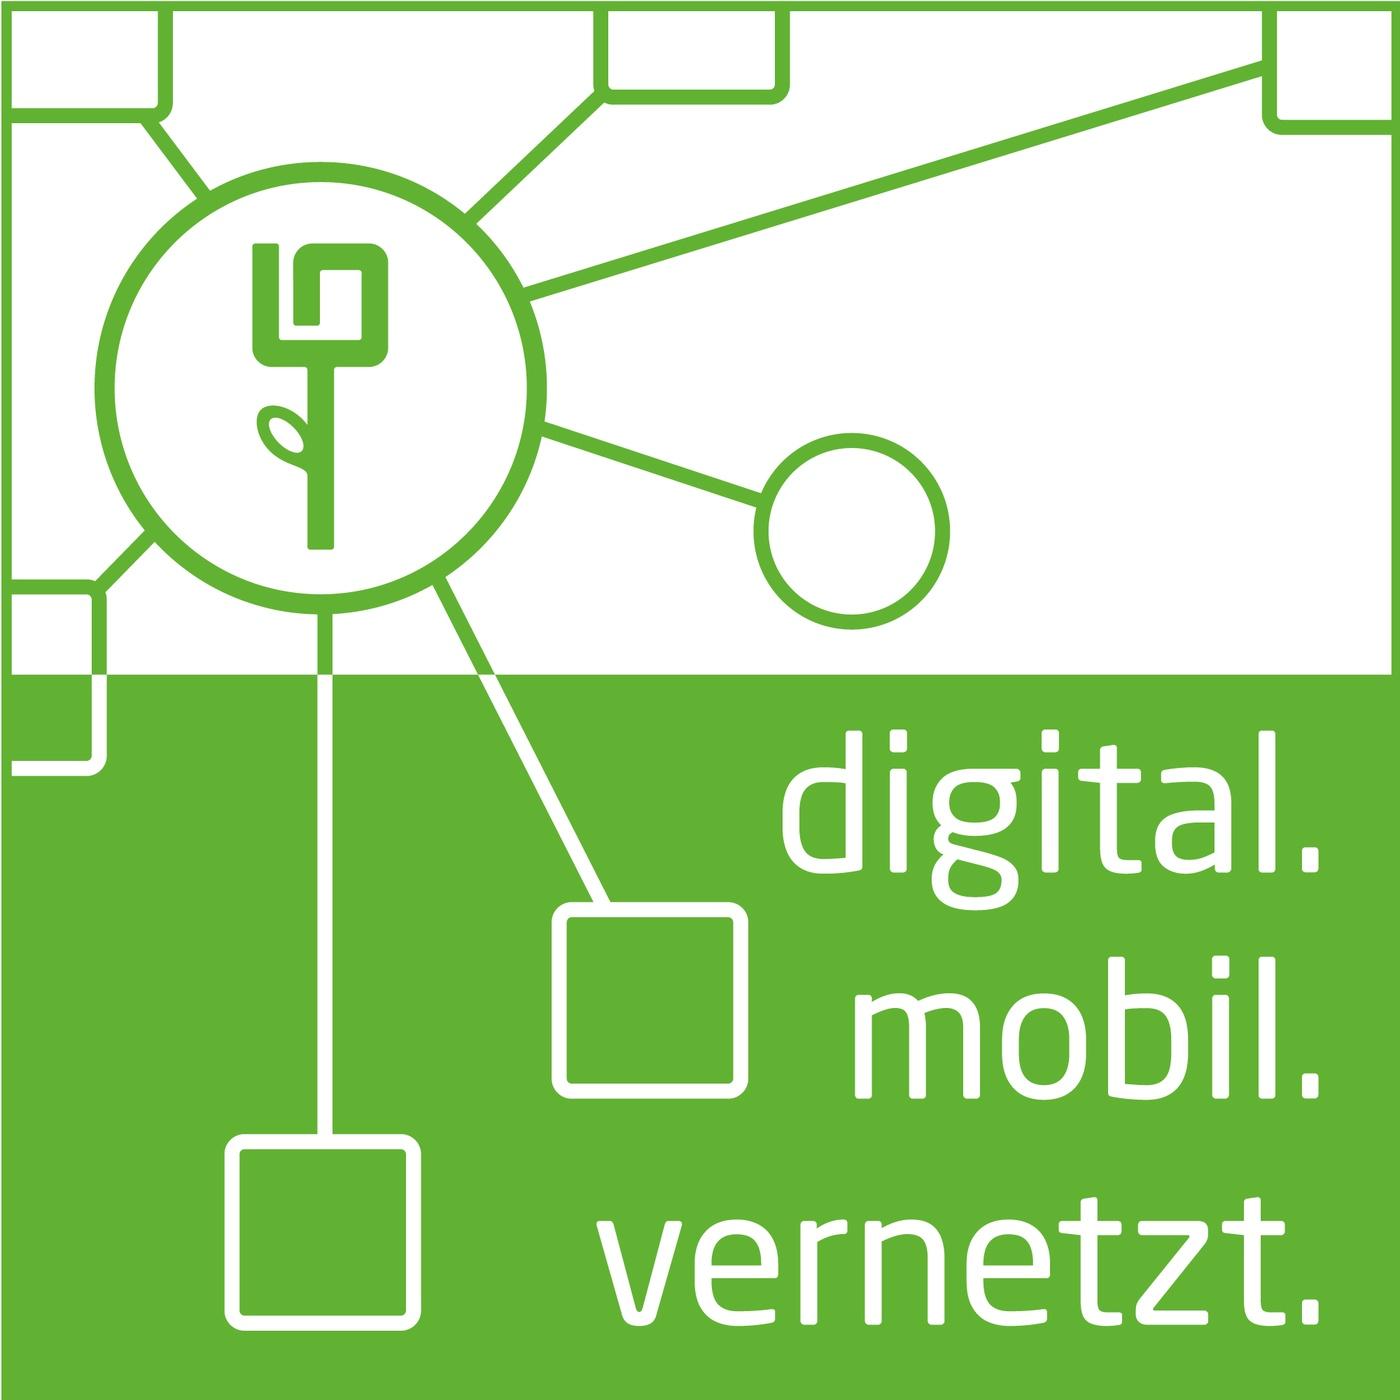 digital. mobil. vernetzt.